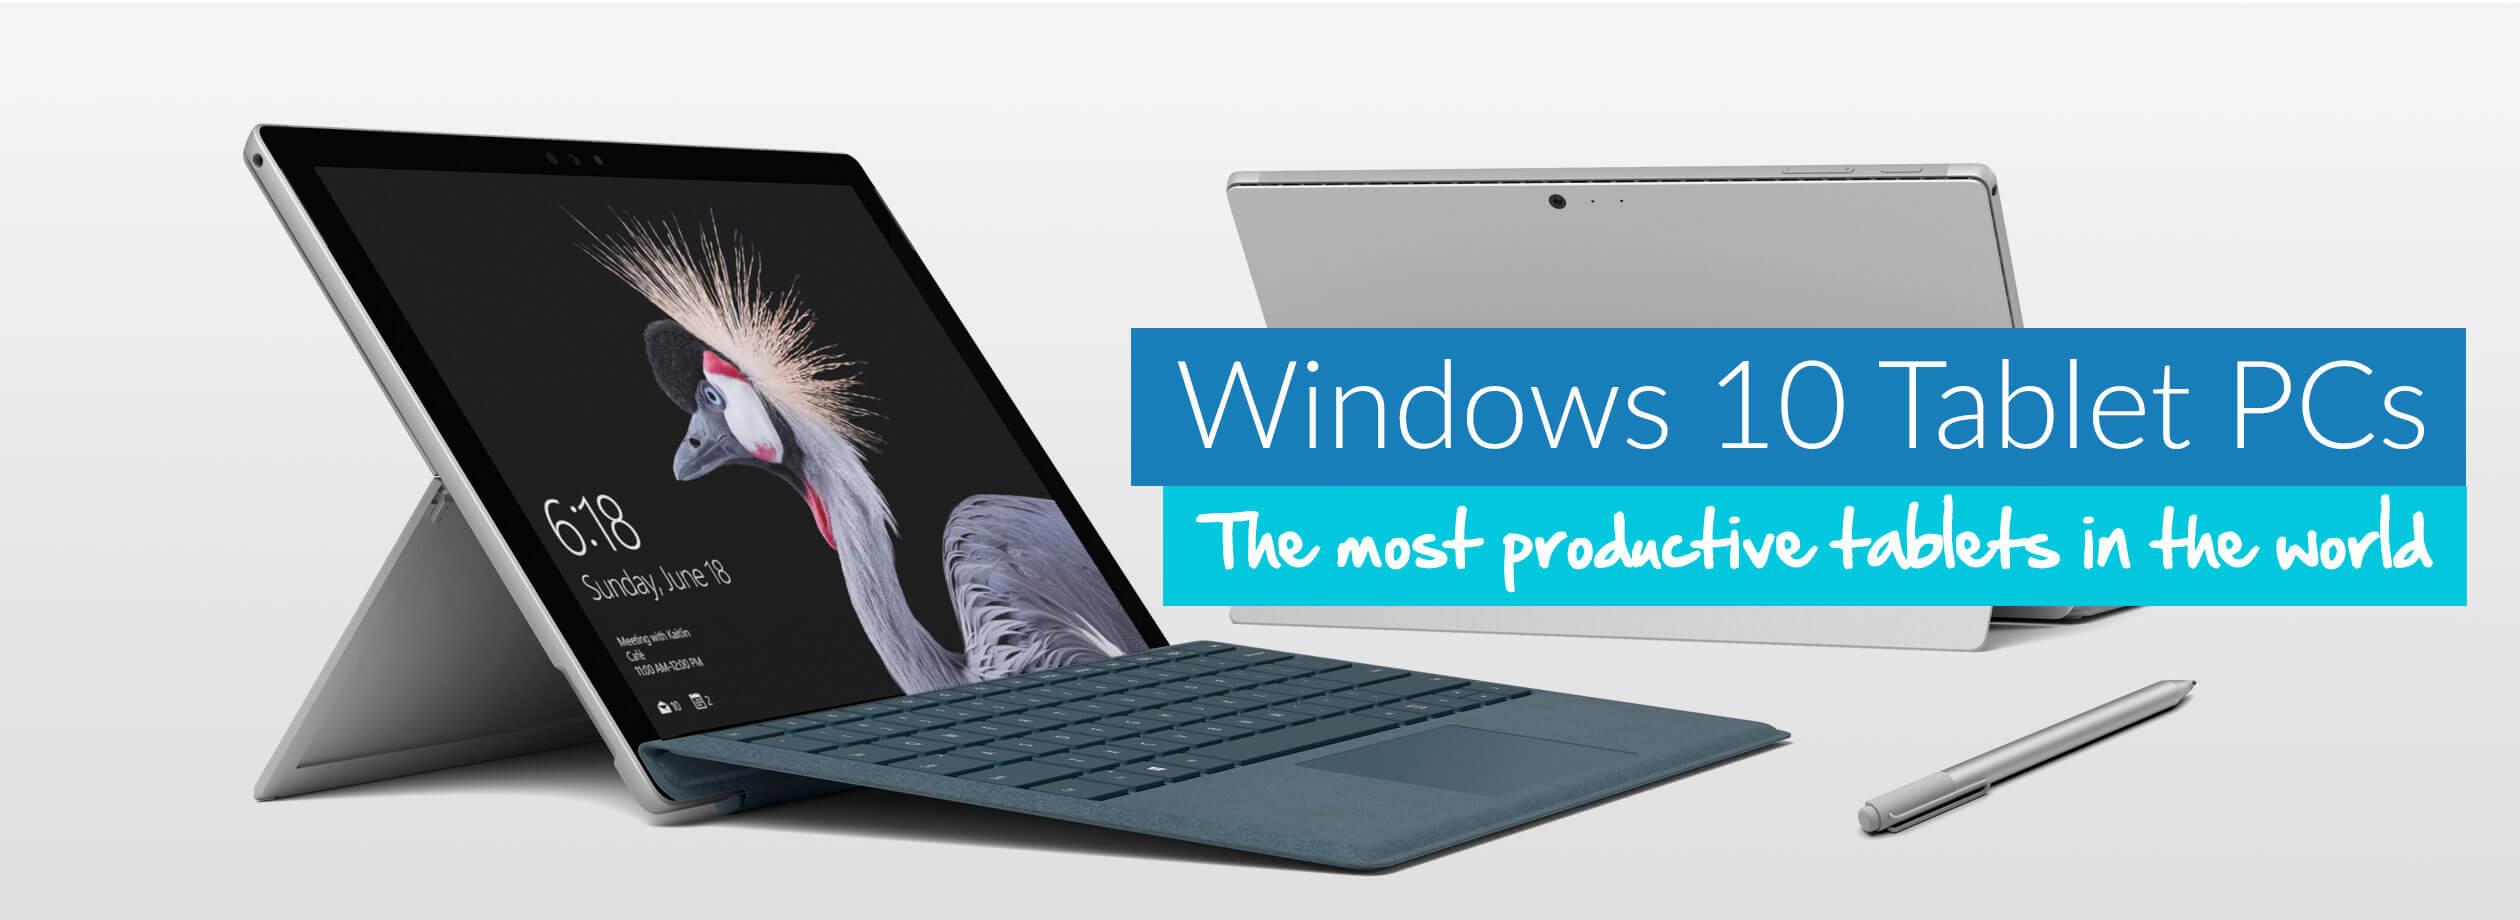 Windows 10 Tablet PCs